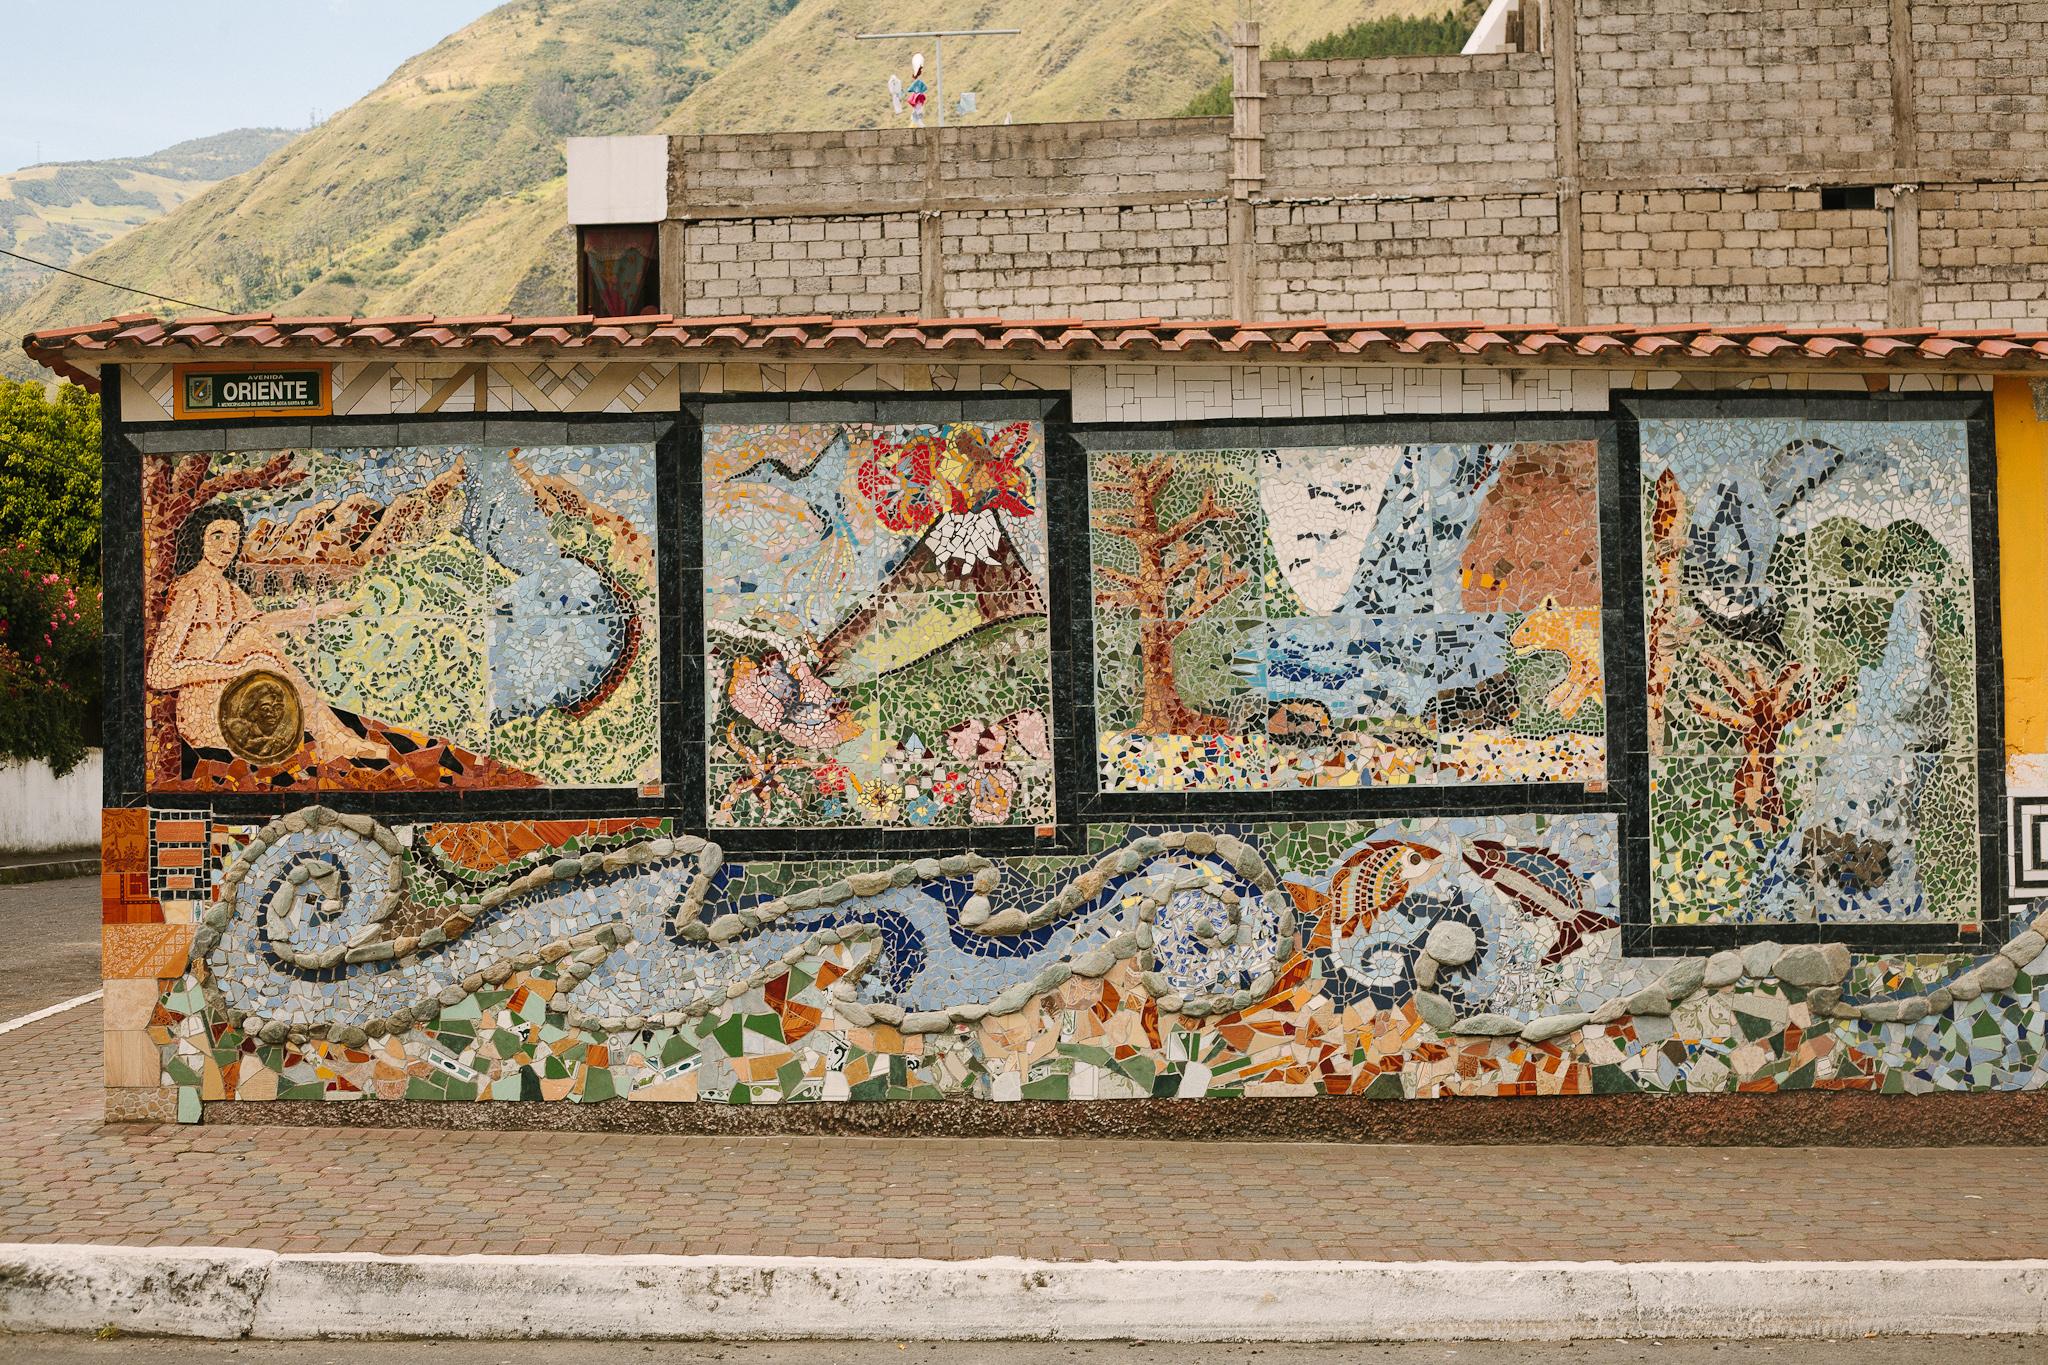 Ecuador2011_Mountains&Sea_Web_jenniferleahy-003.jpg